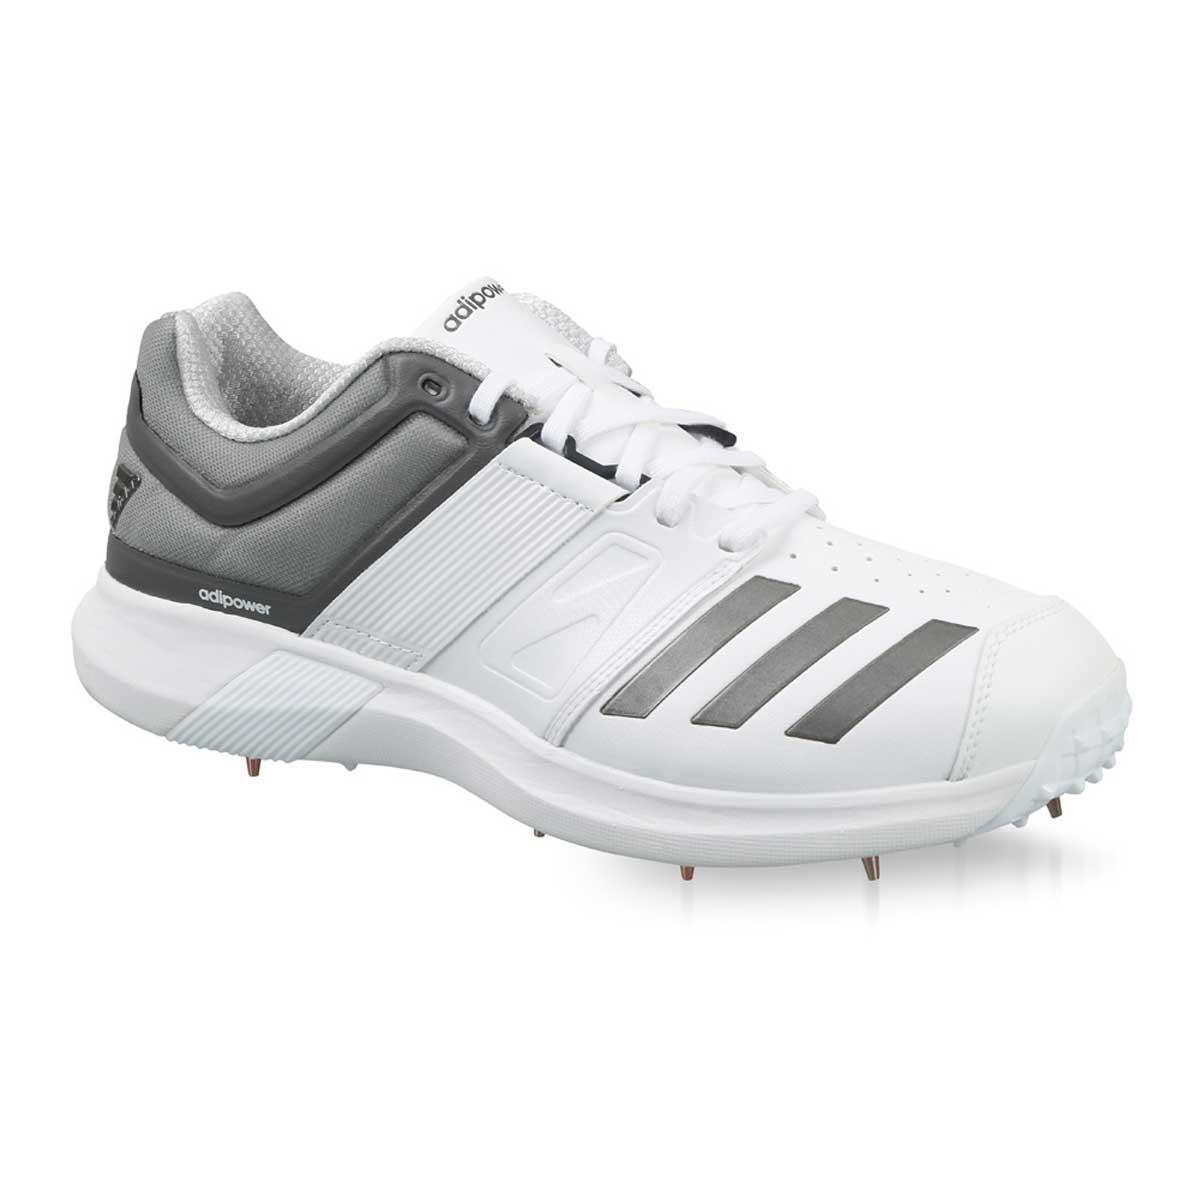 Adidas Adipower Vector Cricket Shoes (White/Grey)